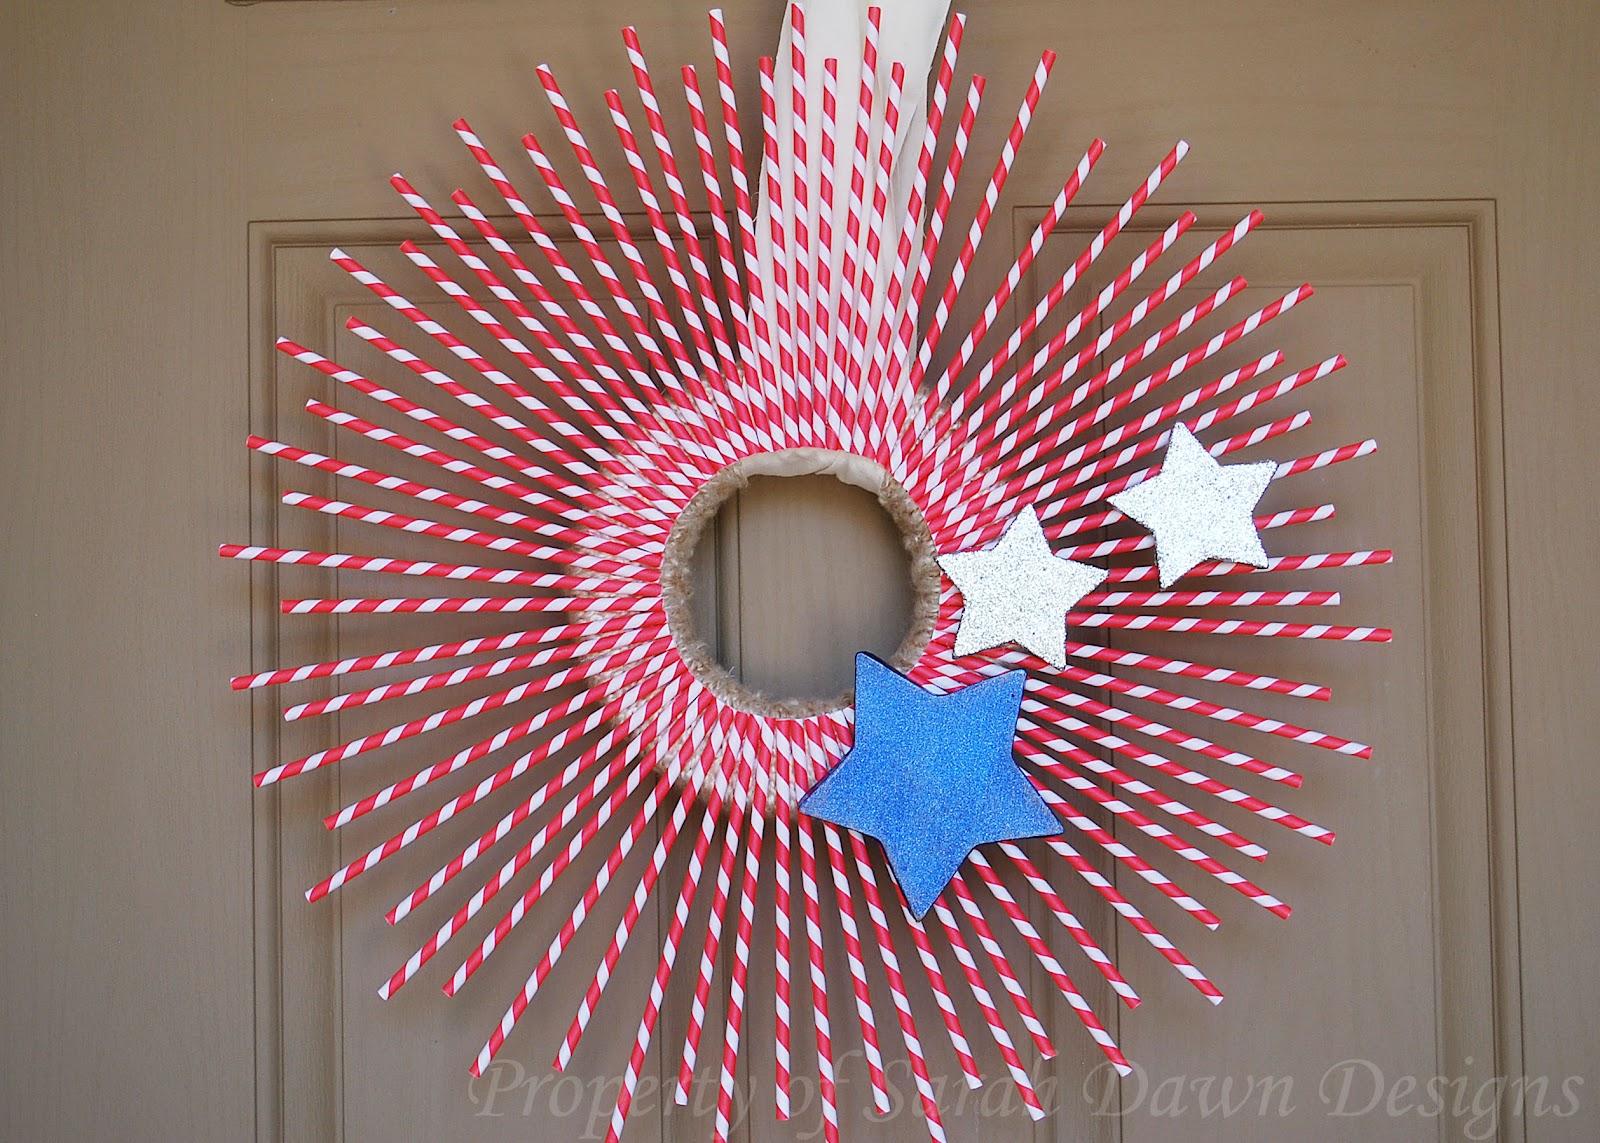 Sarah Dawn Designs Patriotic Wreath Tutorial